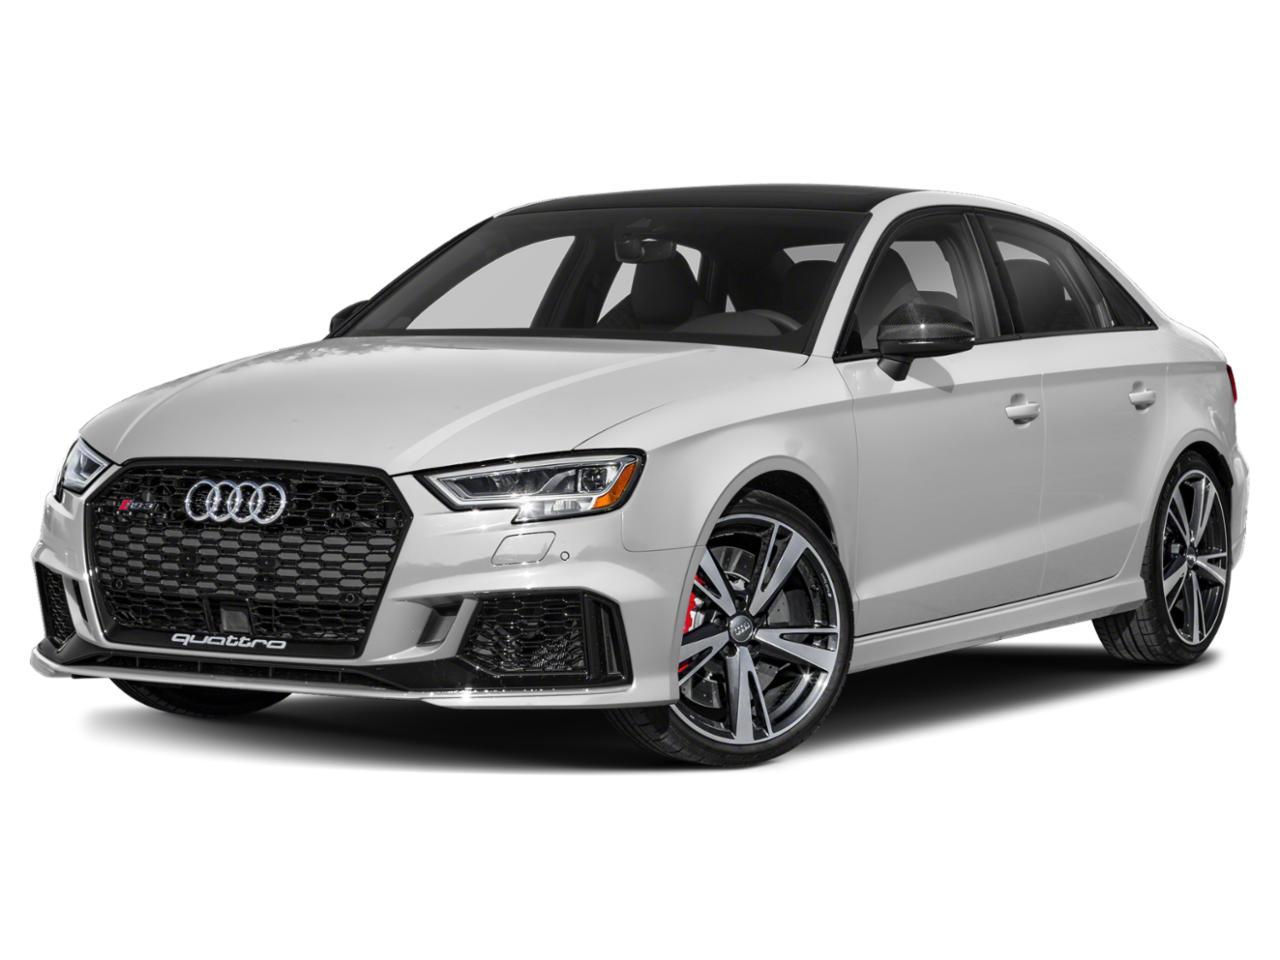 2020 Audi RS 3 Sedan Vehicle Photo in Houston, TX 77090